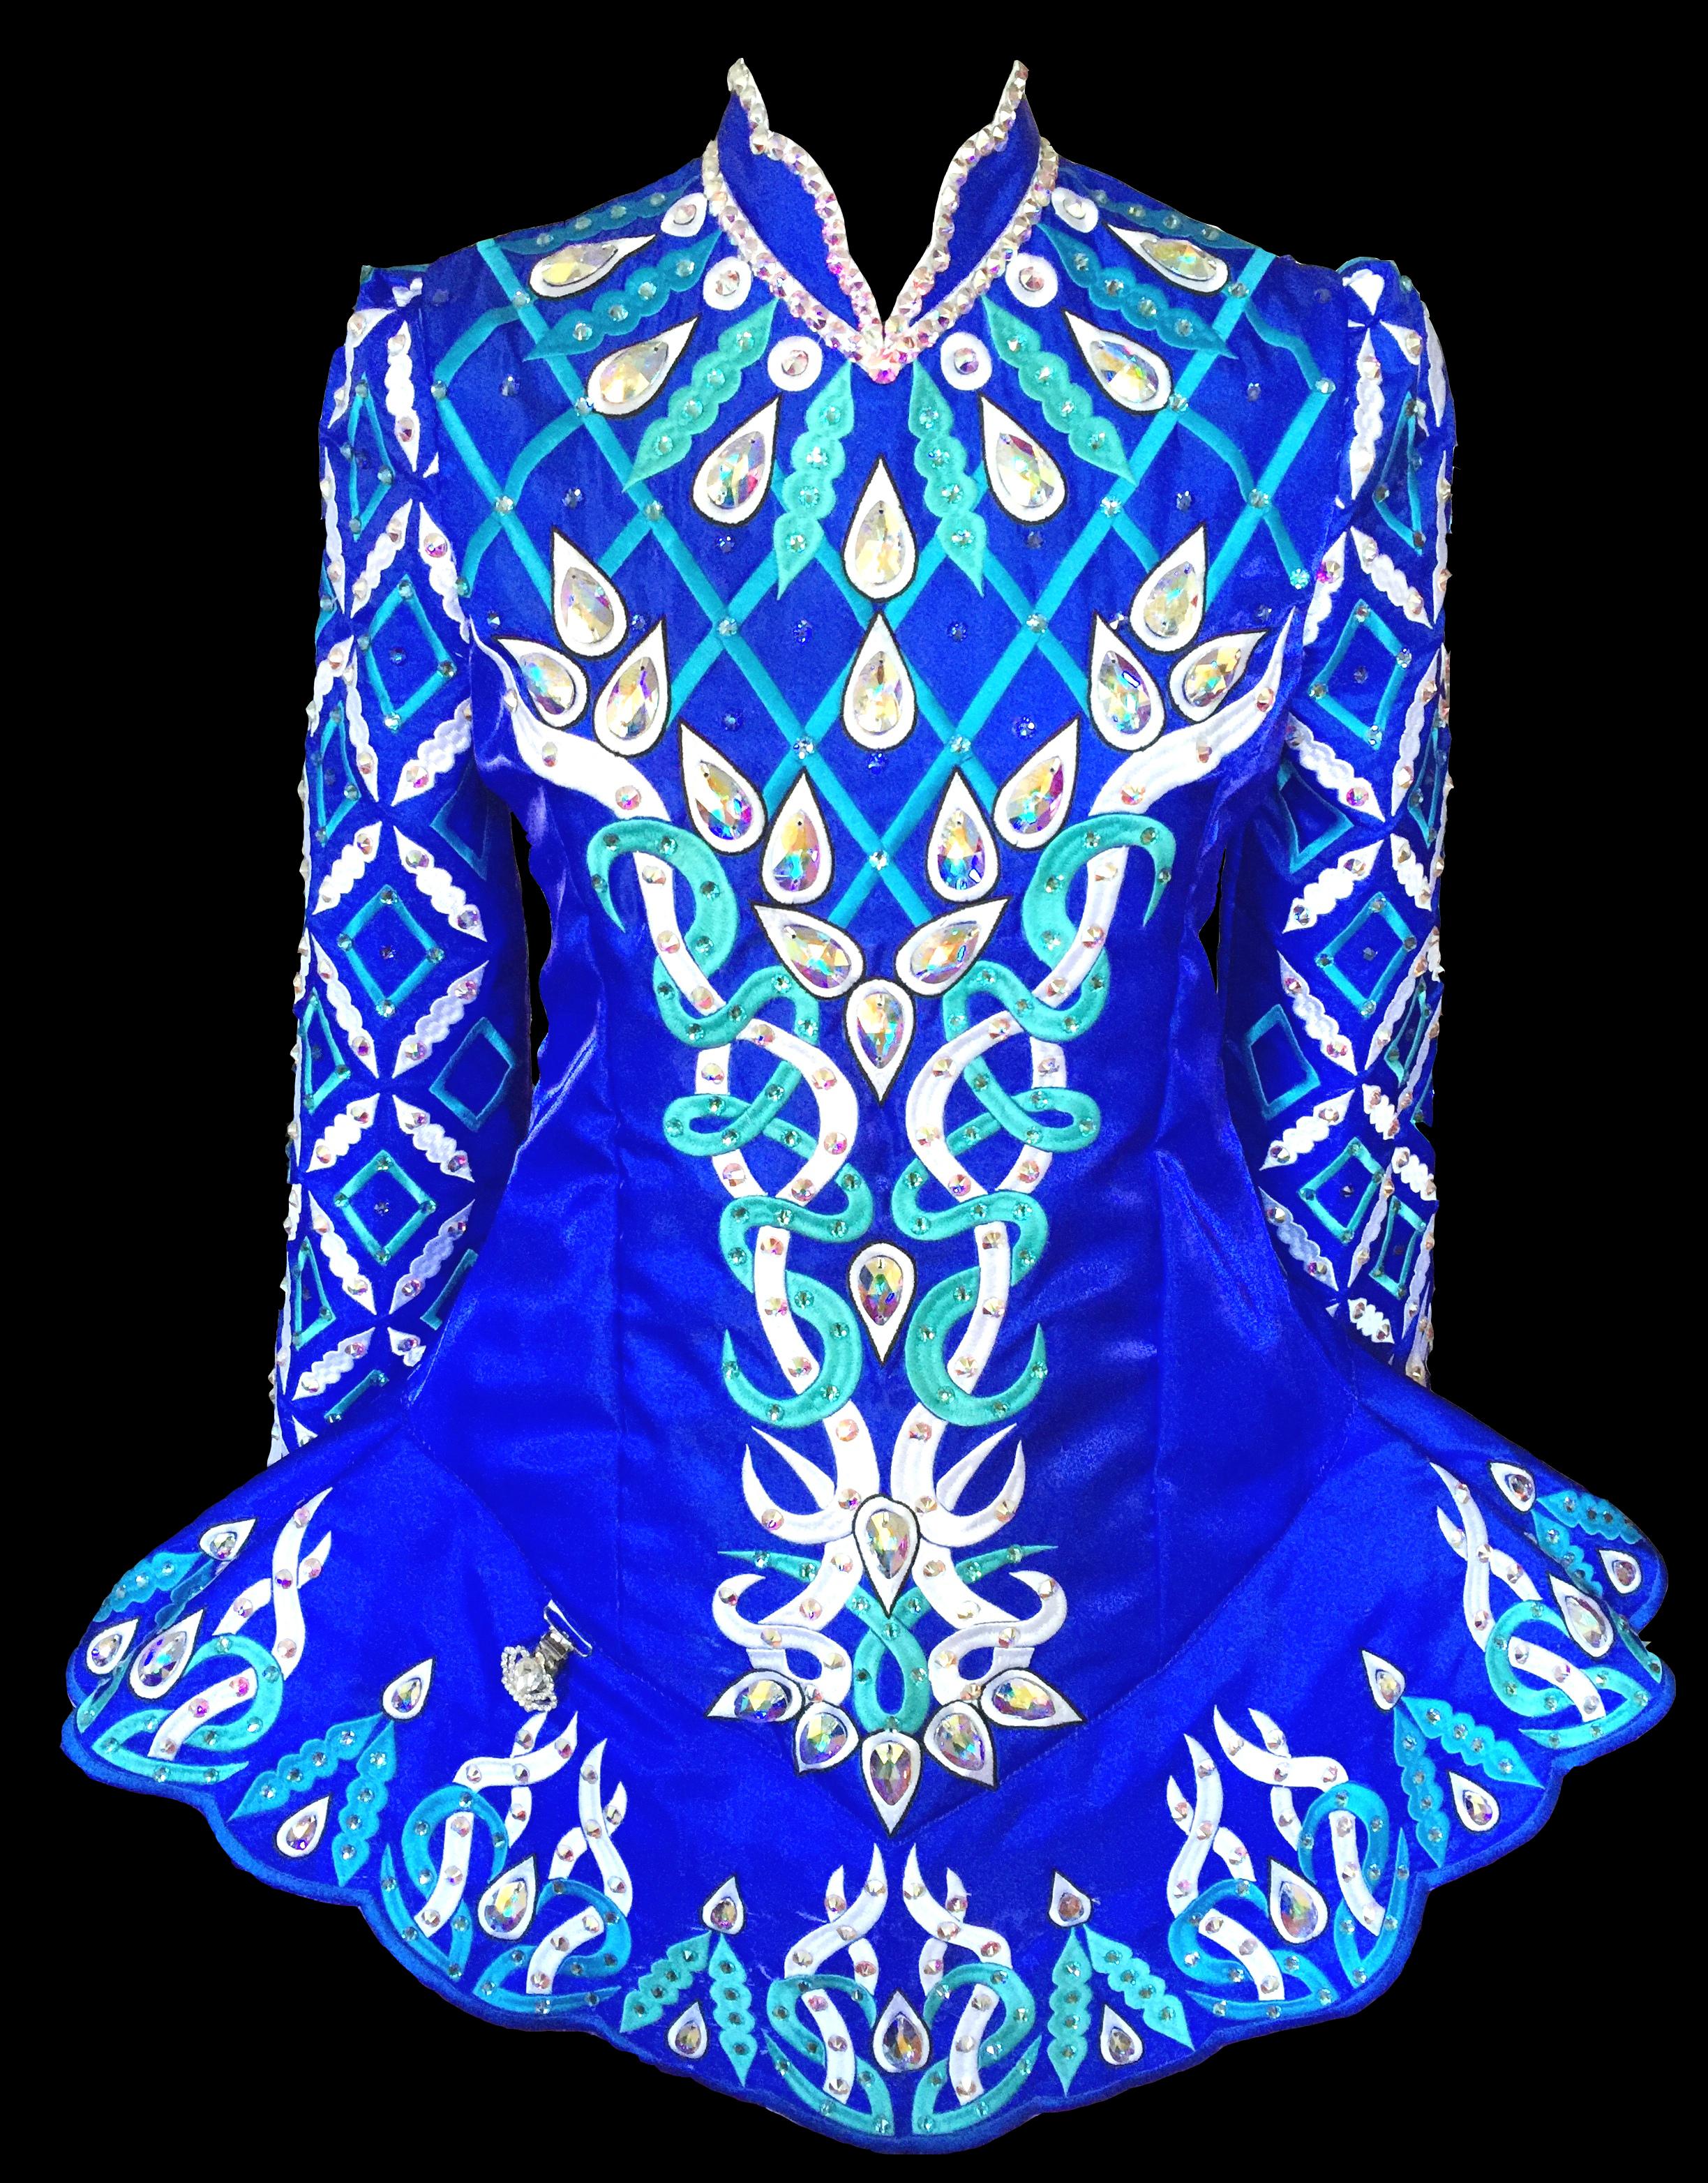 9fc6790a862d7 Kerry Designs Irish Dance Costumes - Calgary, Canada